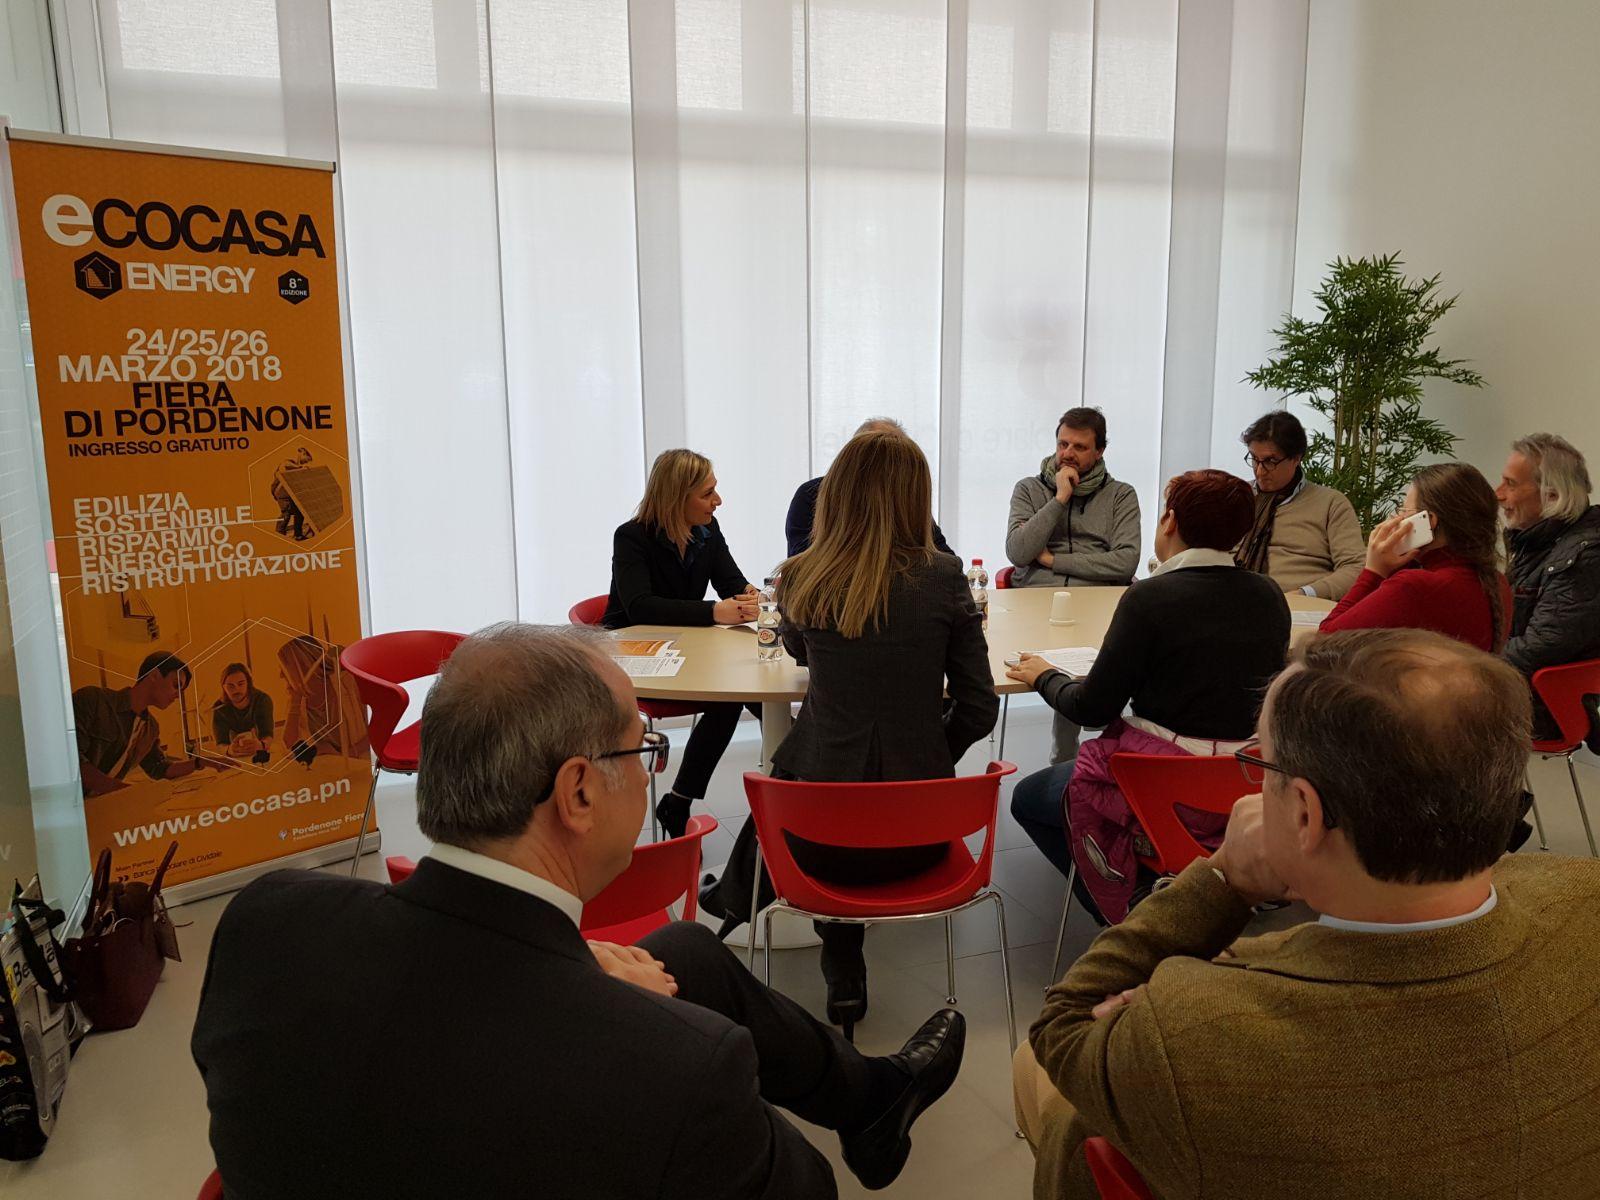 conferenza stampa ecocasa